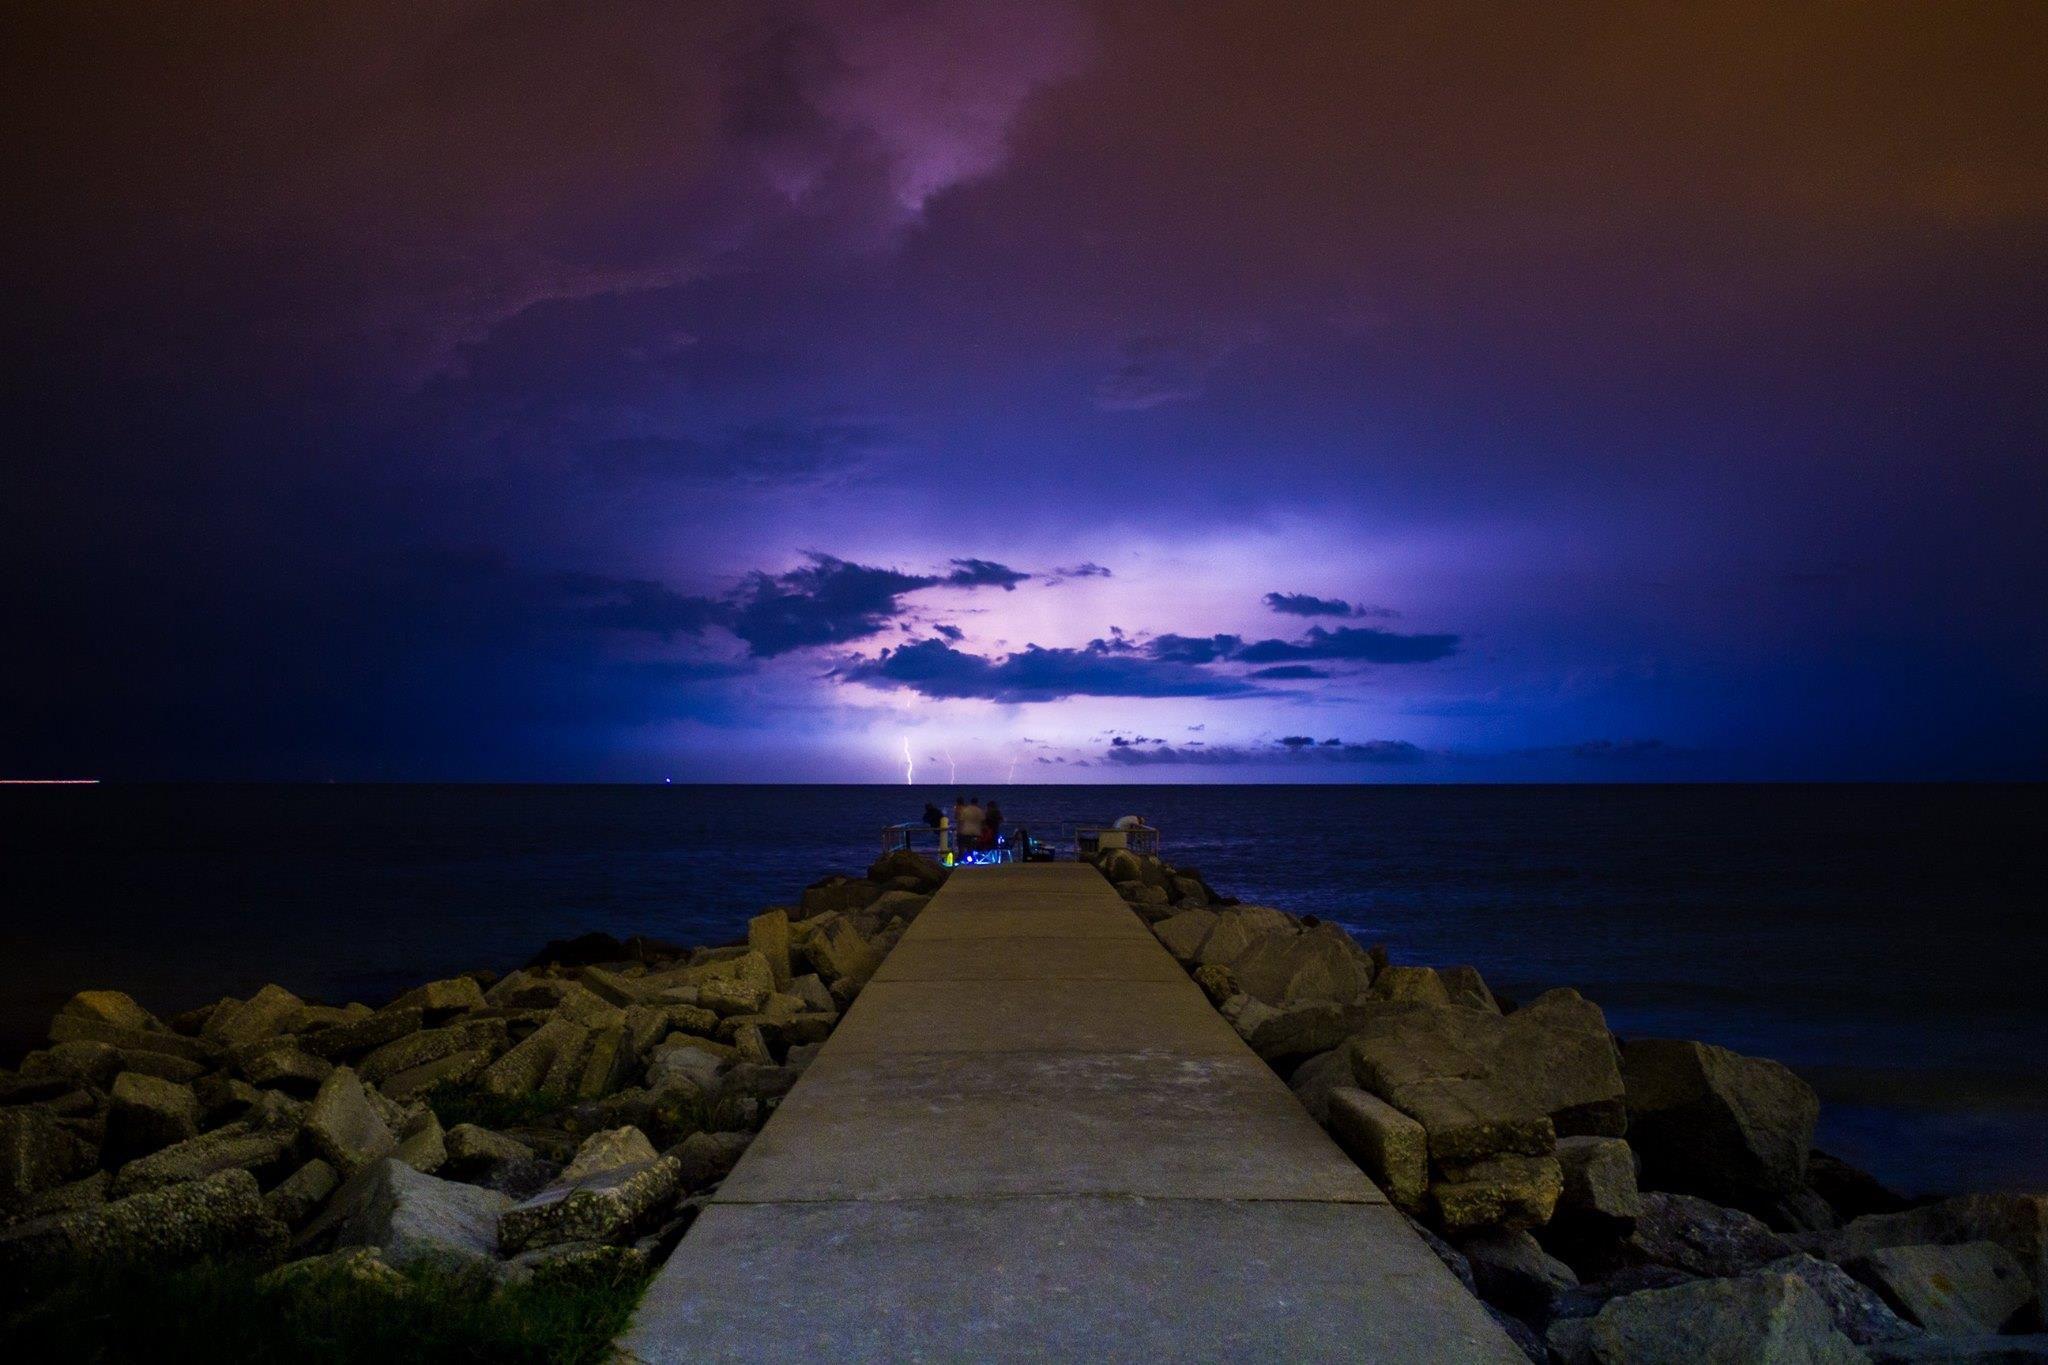 cool shot of lightning illuminating the sky off st pete beach last night great